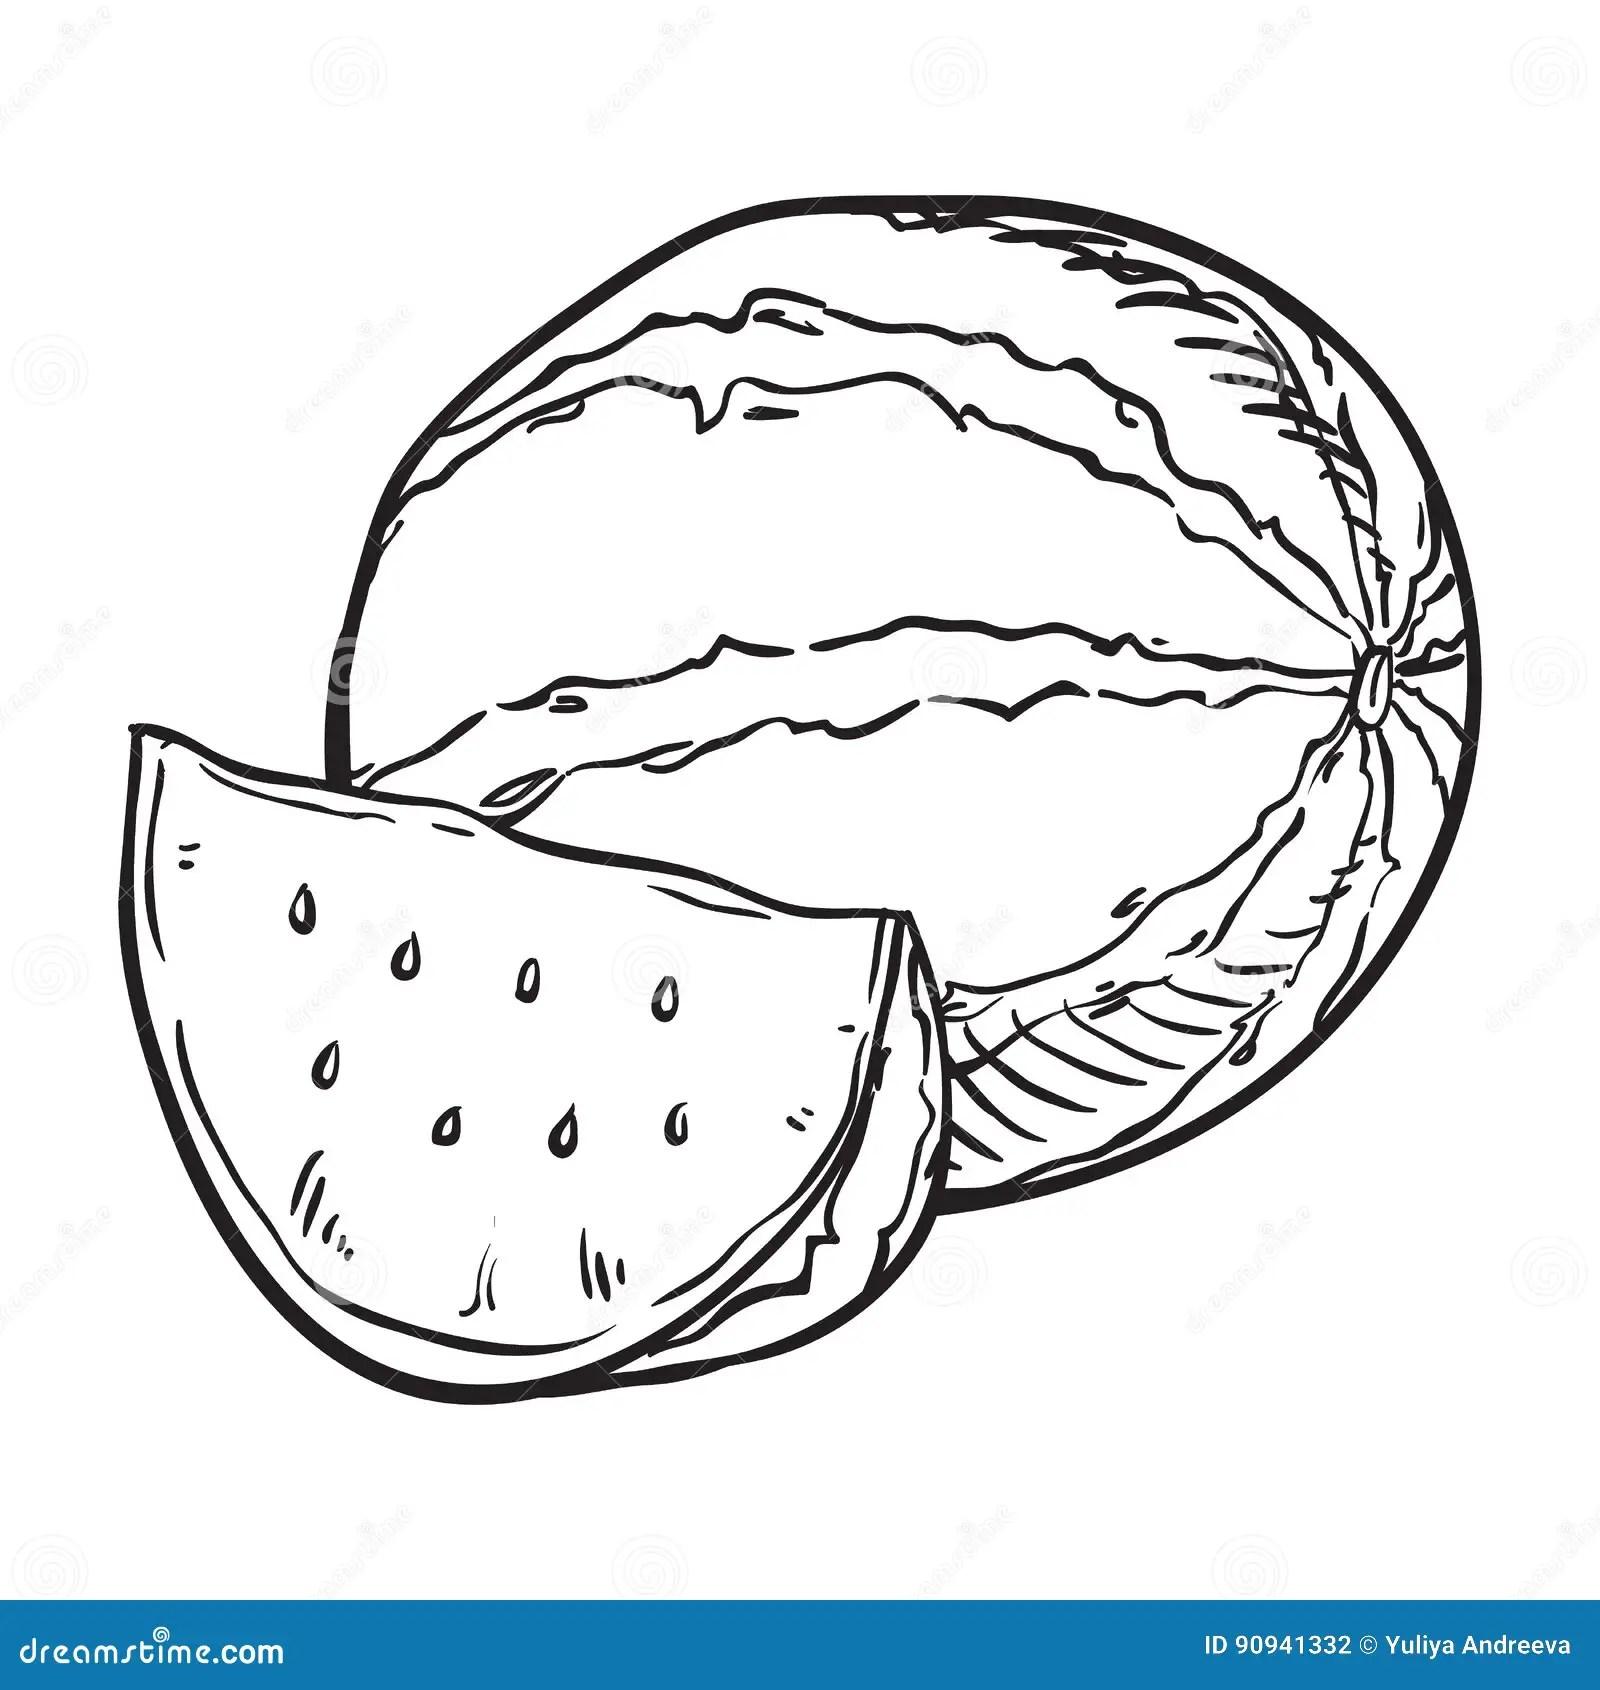 Hand Drawn Sketch Watermelon Illustration Stock Vector